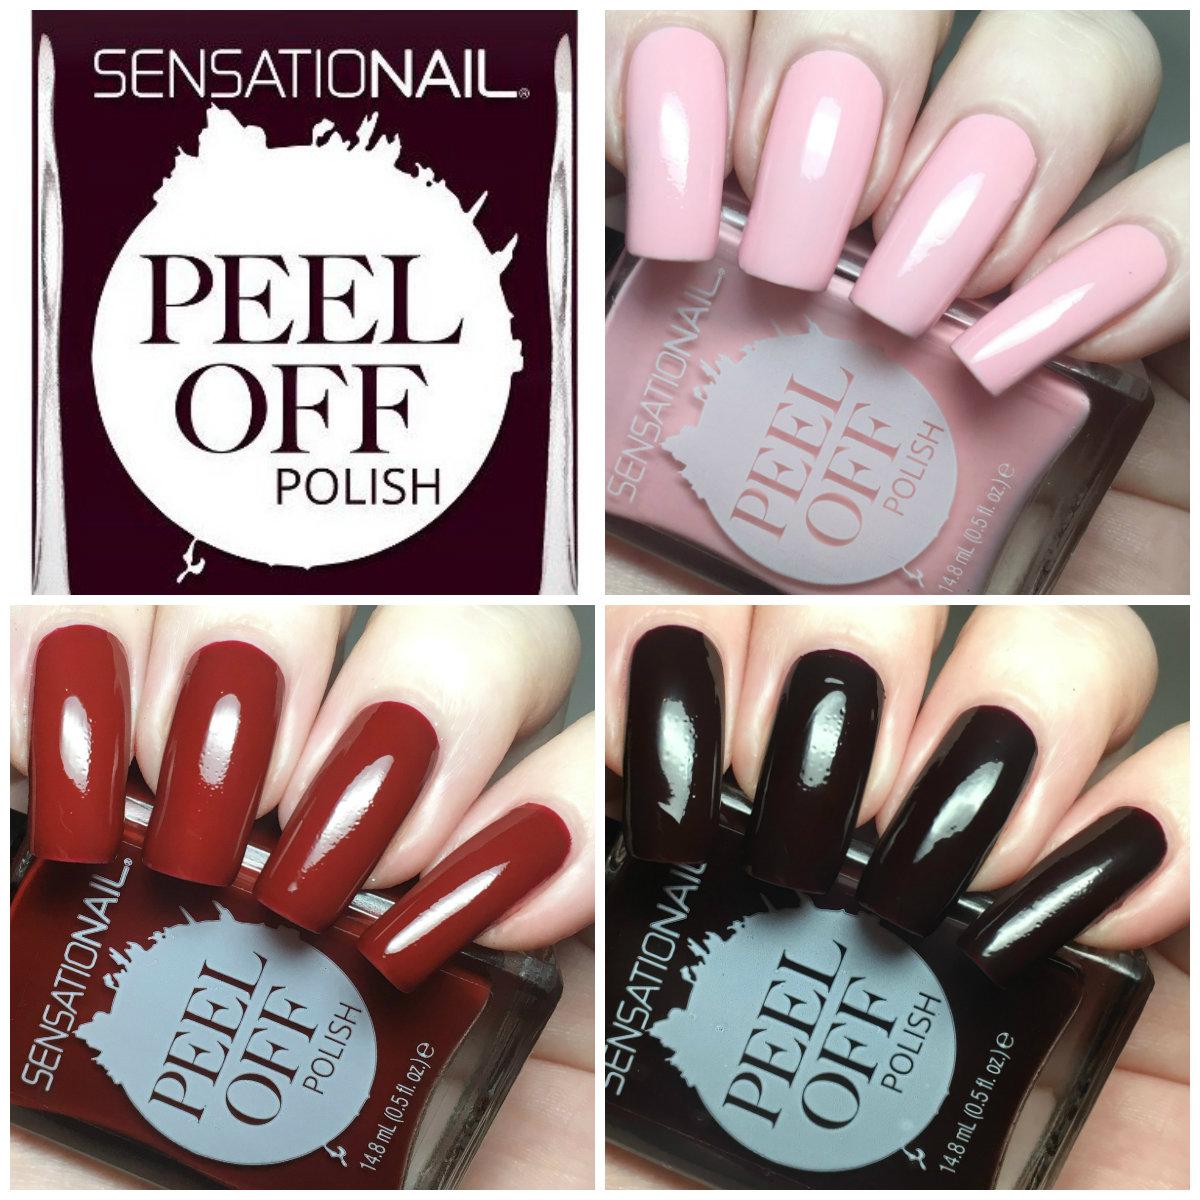 A Certain Becca Nails: SensatioNail Peel Off Nail Polishes